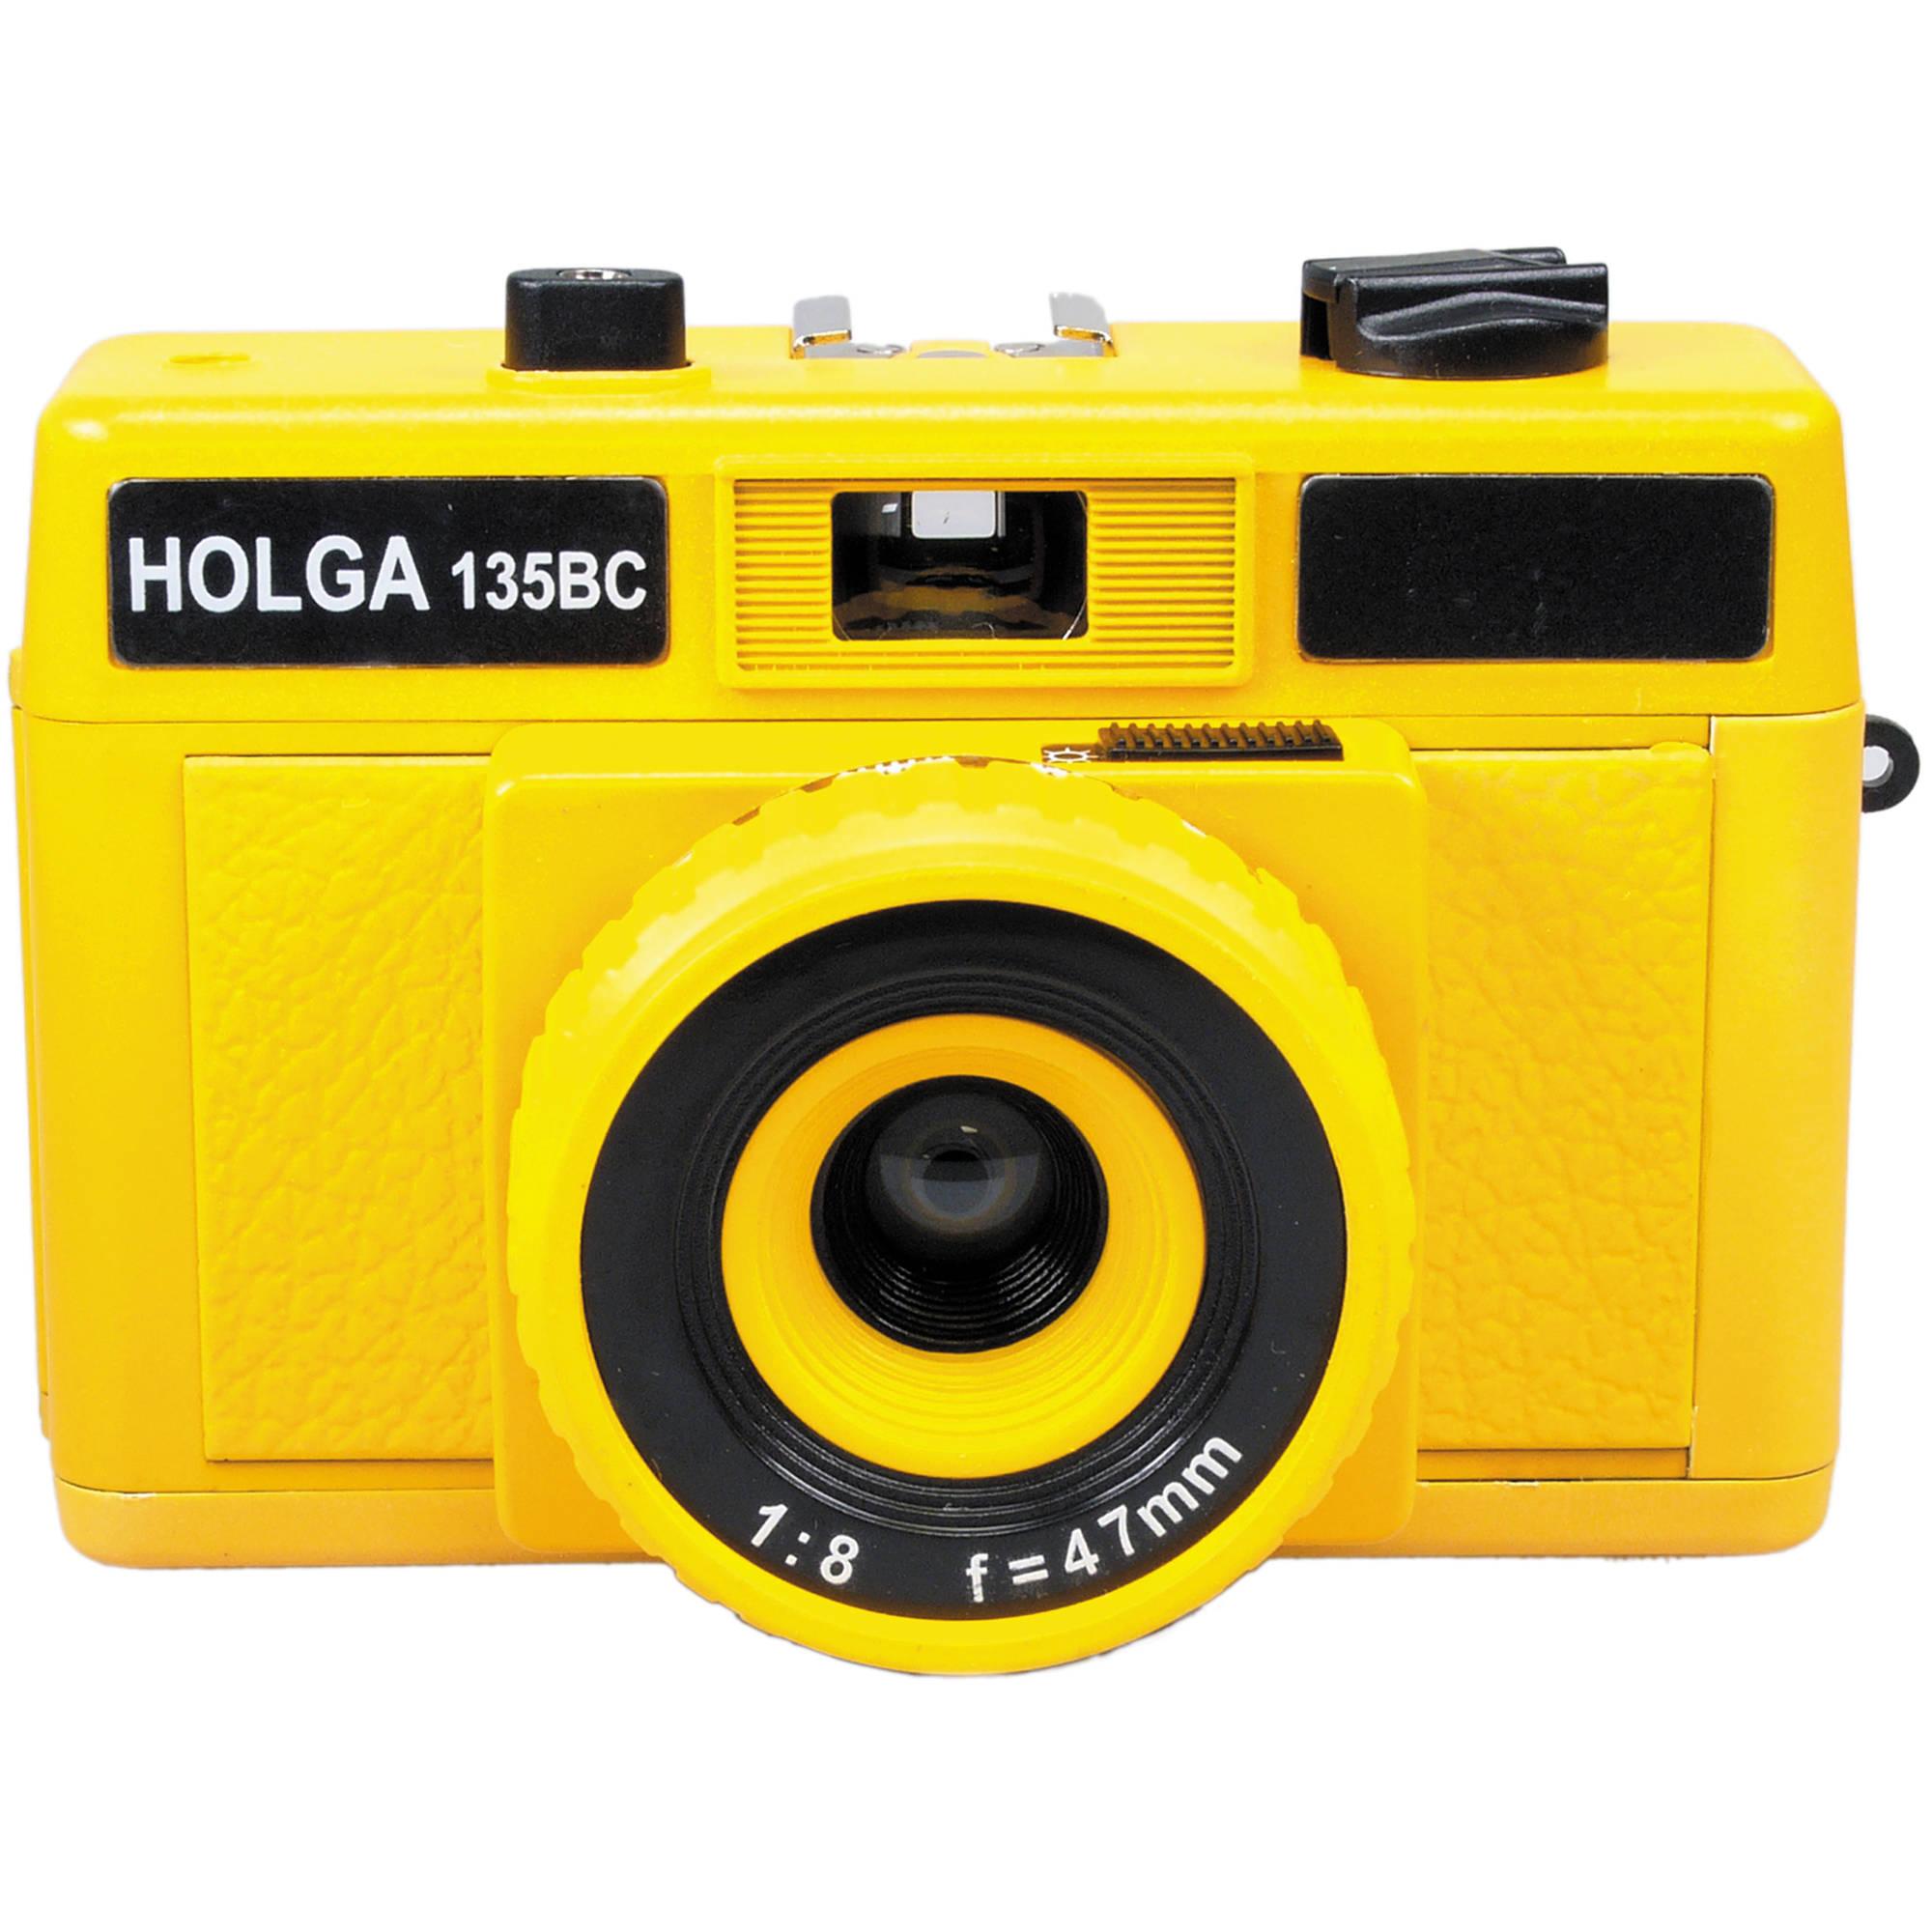 Holga HolgaGlo 135BC Glows in the Dark Camera 223135 B&H Photo